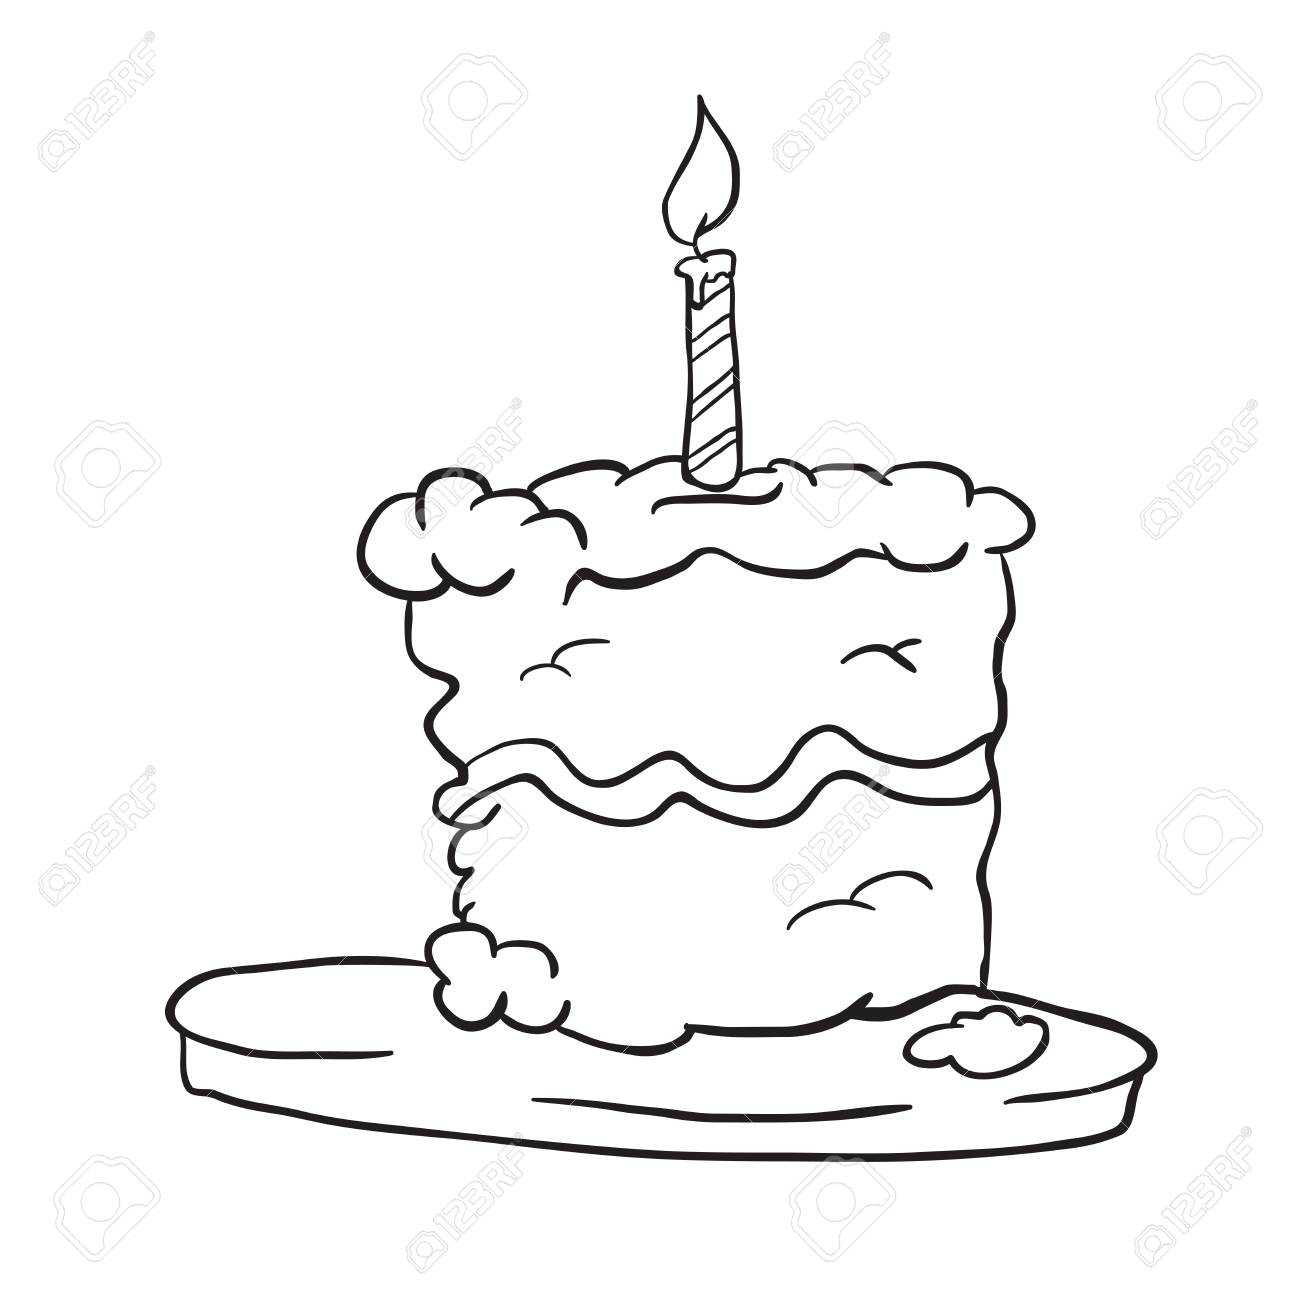 Birthday Cake Cartoon Black And White Download Wallpaper